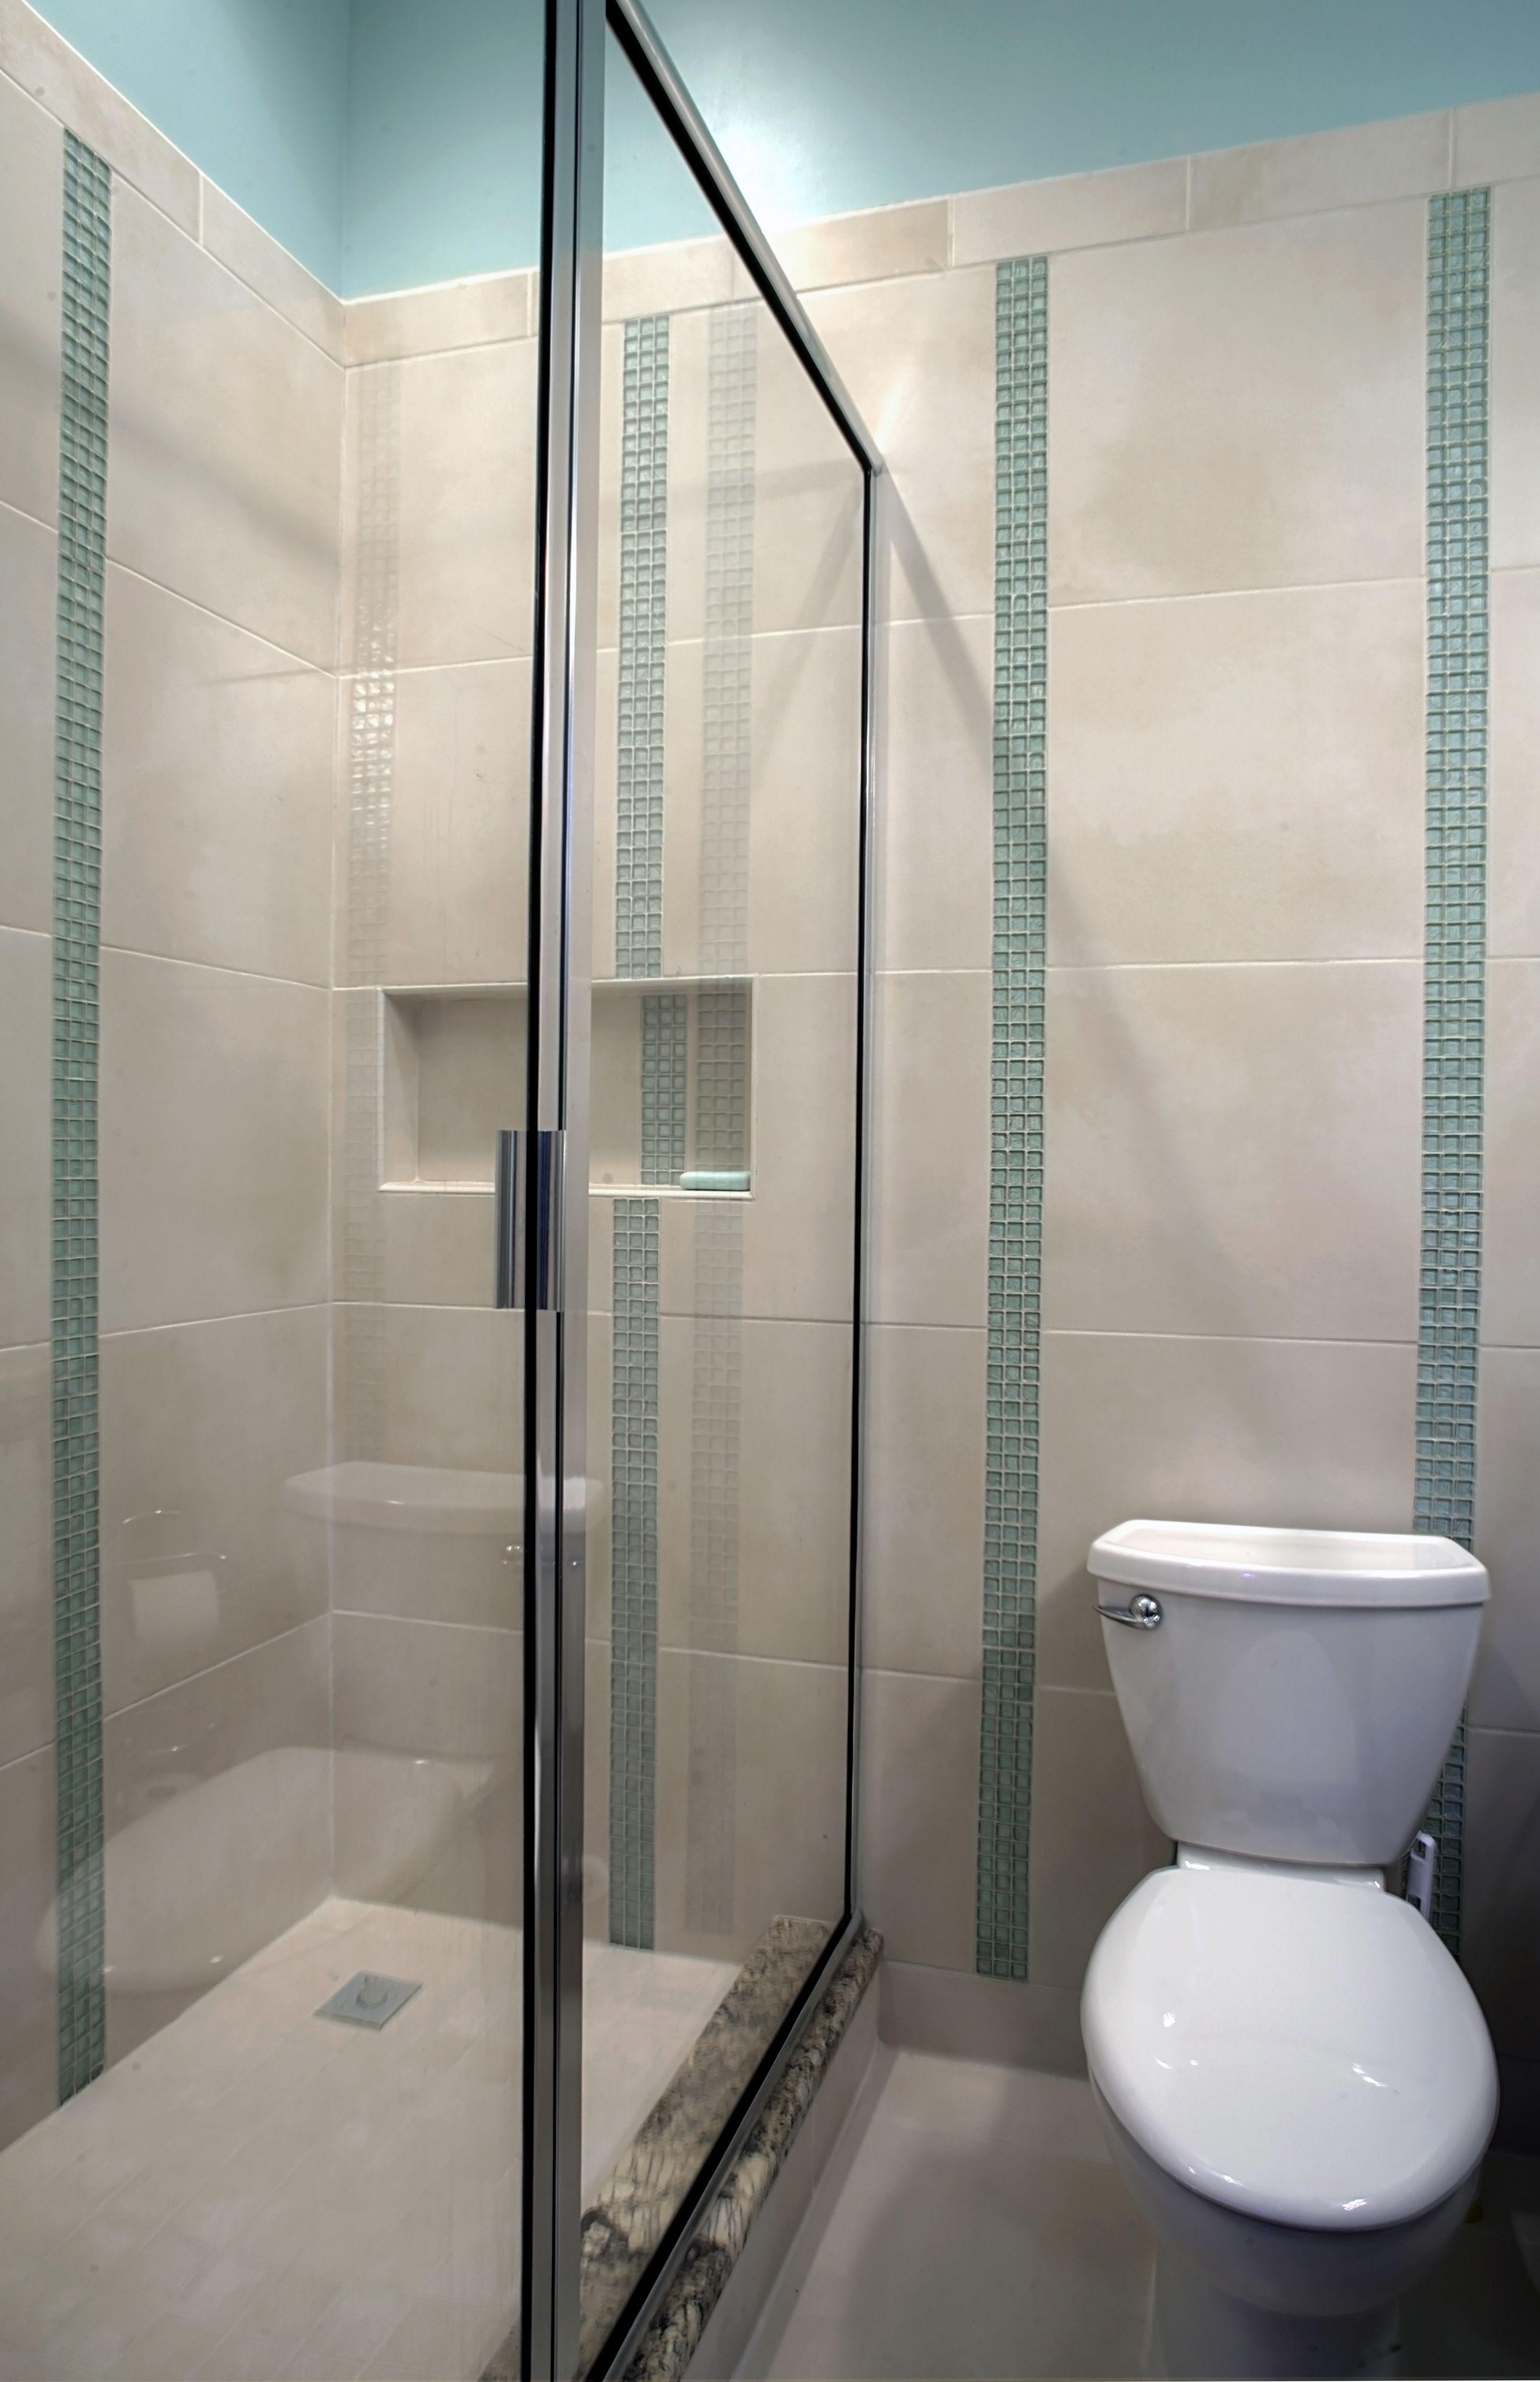 Bathroom Fresh Minimalist Small Shower Bathroom Ideas Photo Gallery With  Glass Door And Modern Blue Tiling Idea Ingenious Simple Small Guest Bathroom  Design ...